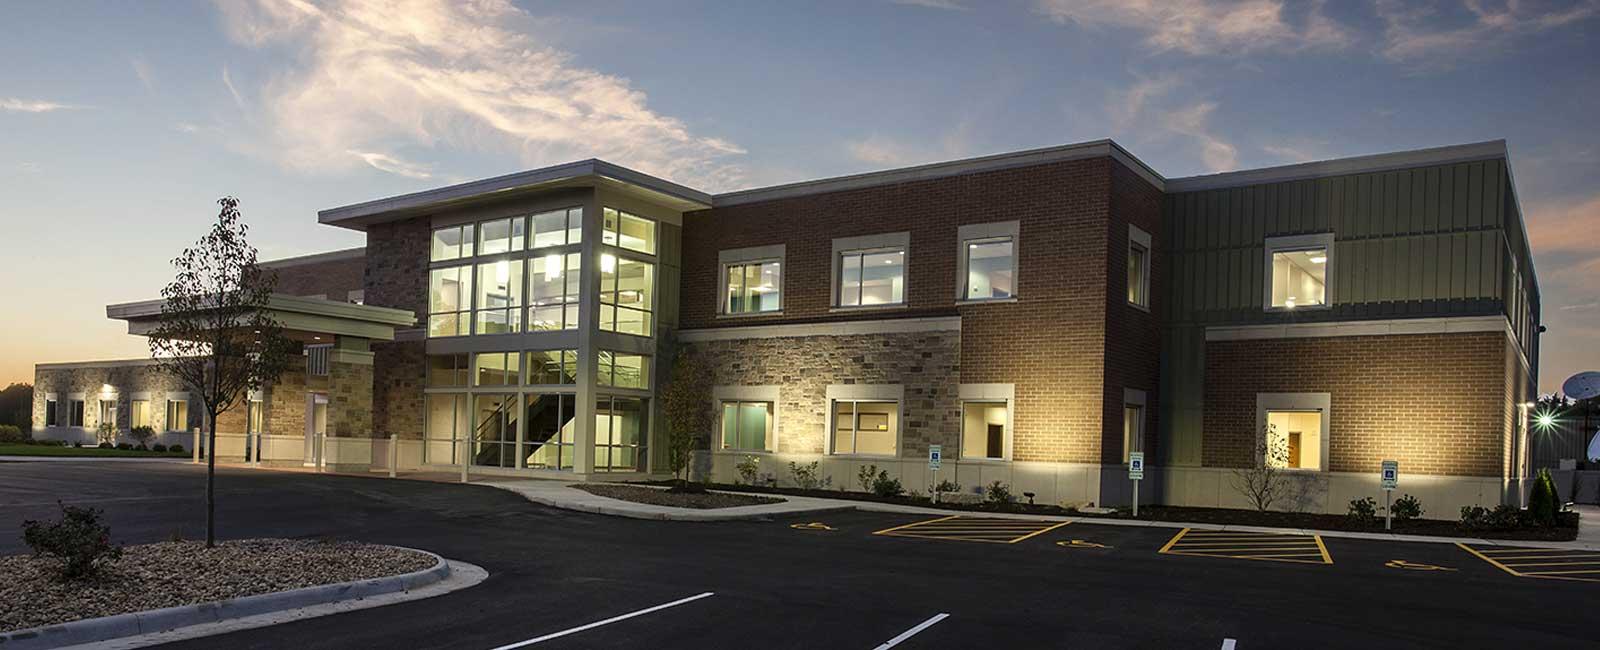 Genesis Healthplex Moline Tri City Electric